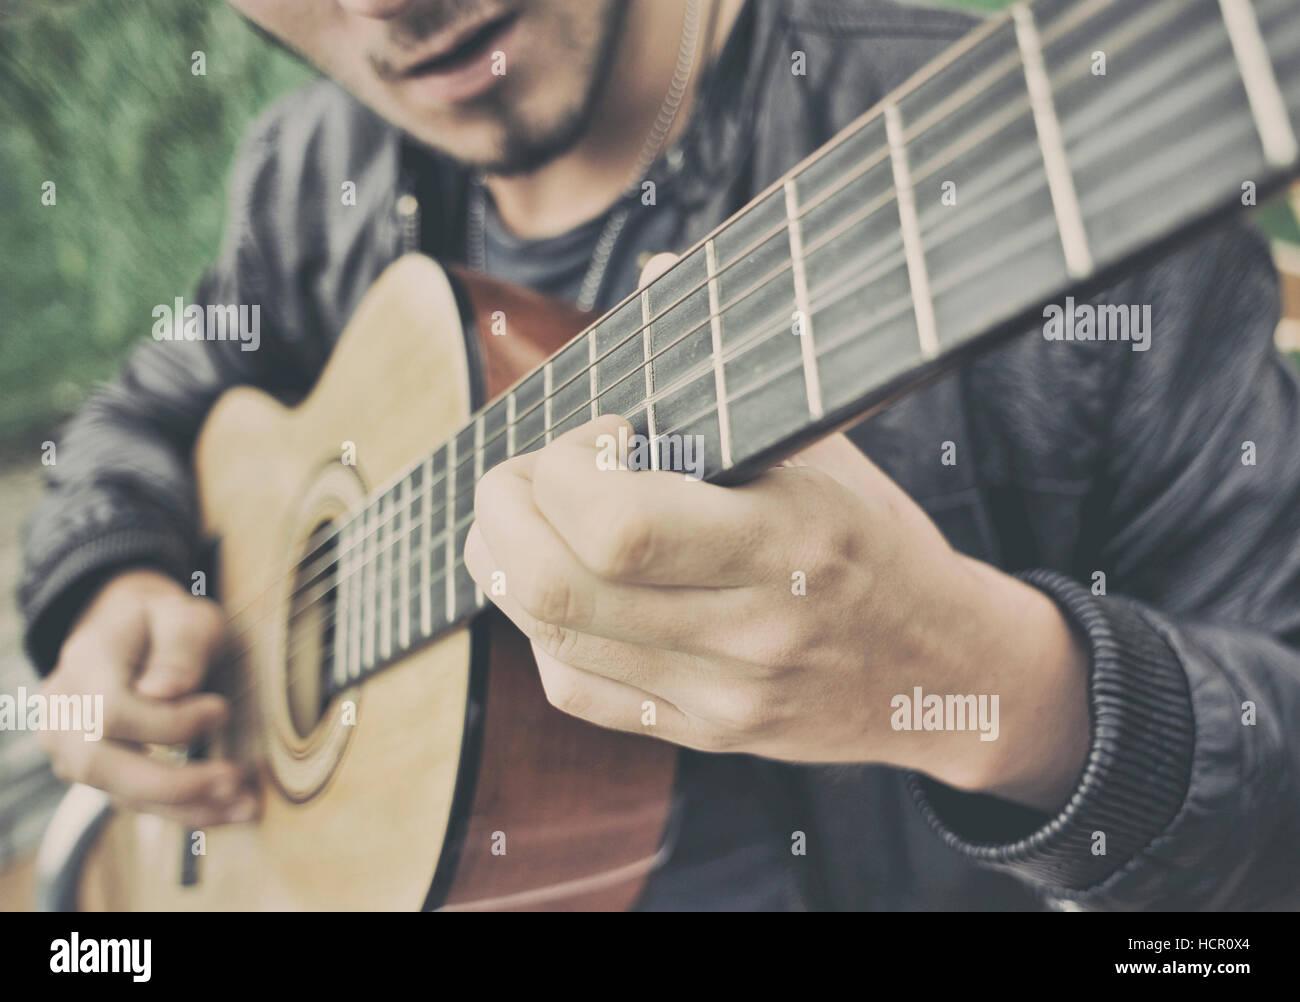 Man playing a guitar - Stock Image